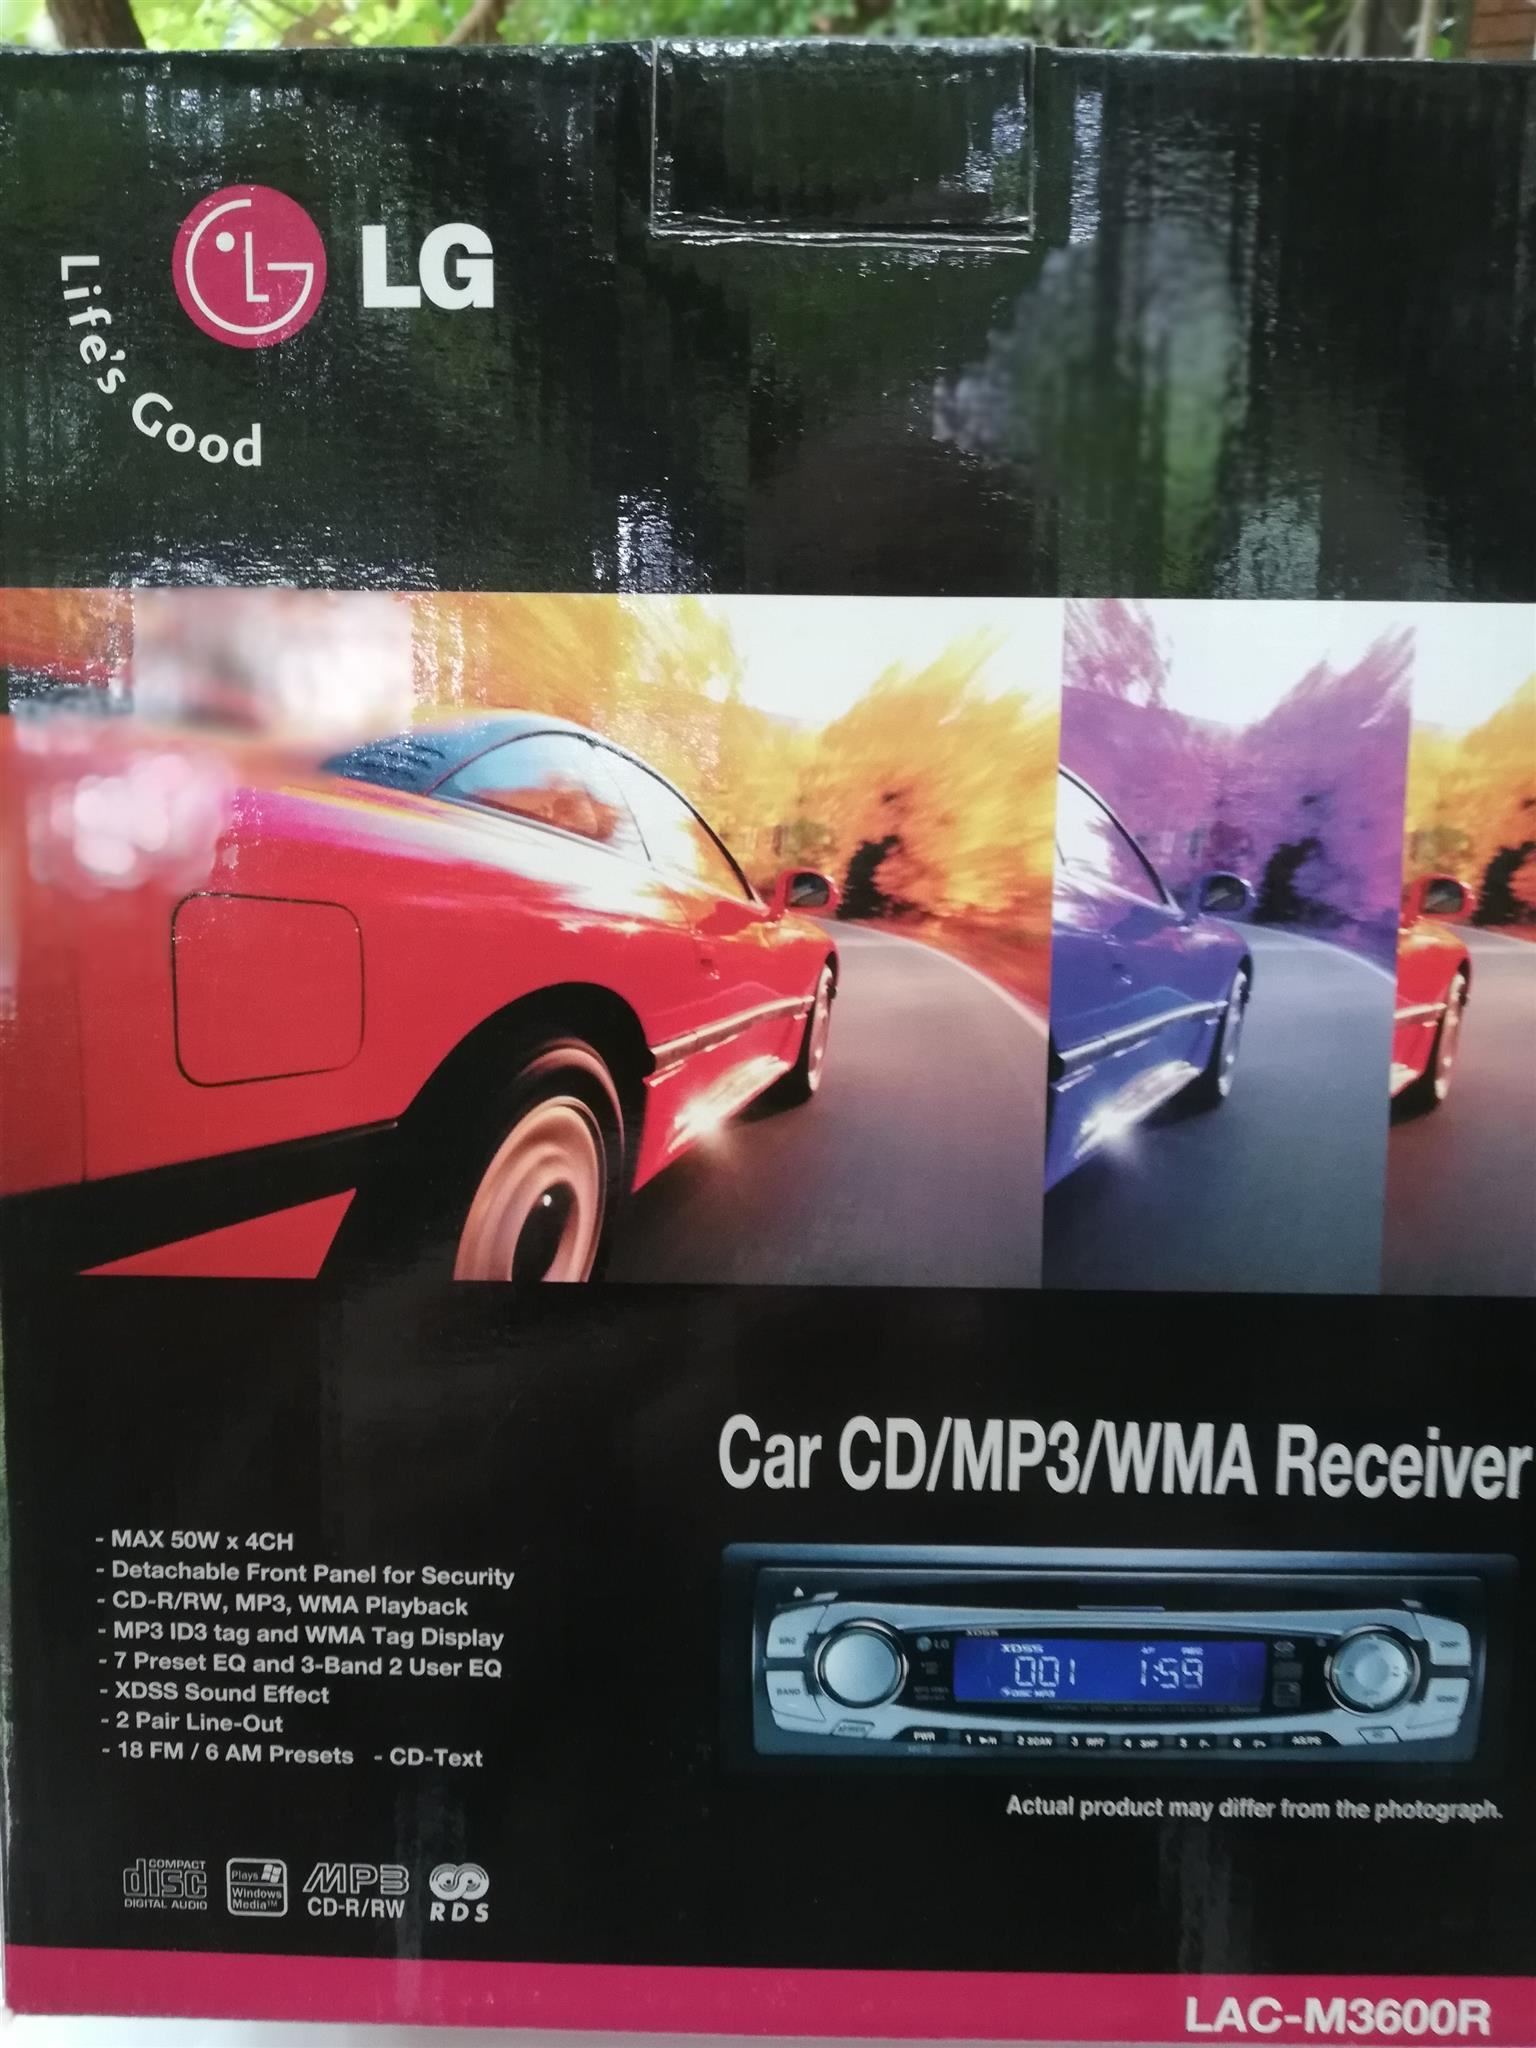 LG Car Stereo CD/MP3  50W x 4 LAC-M3600R